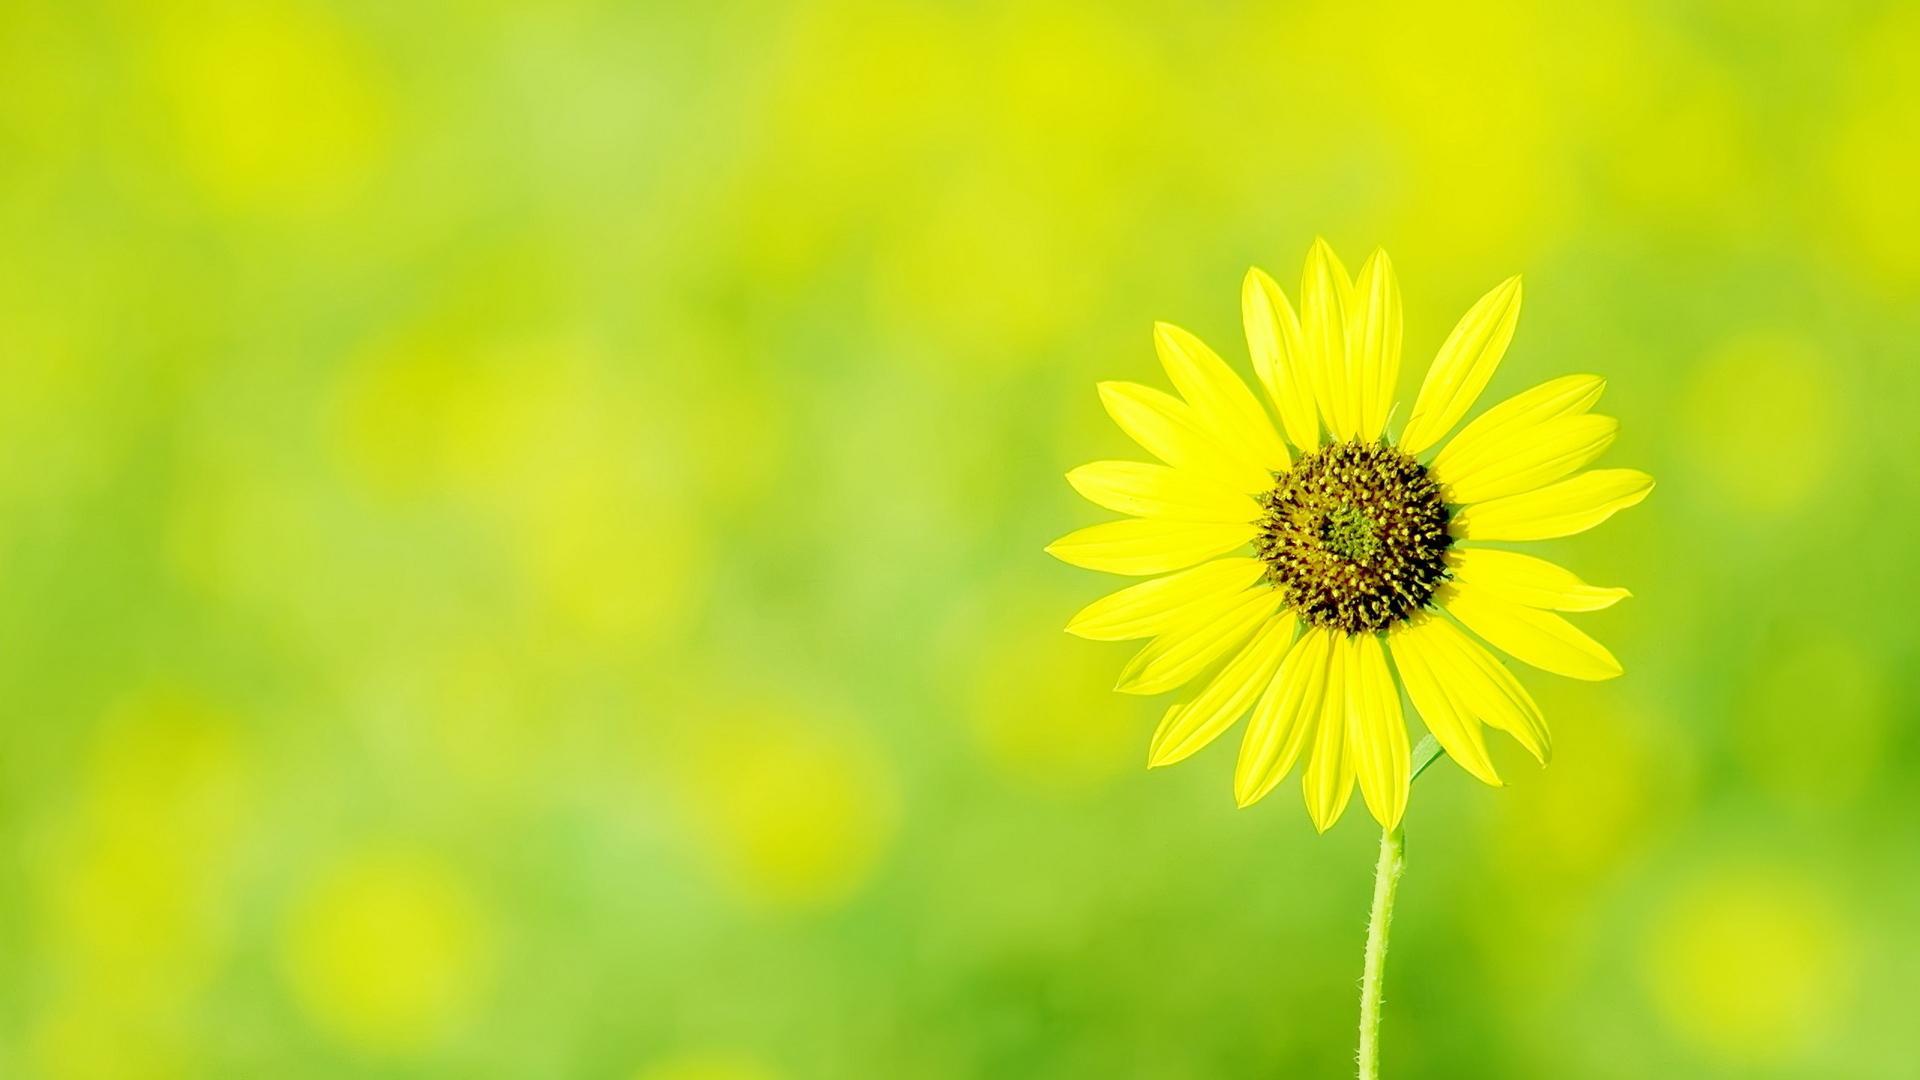 Цветы цветы ромашка желтый цветок